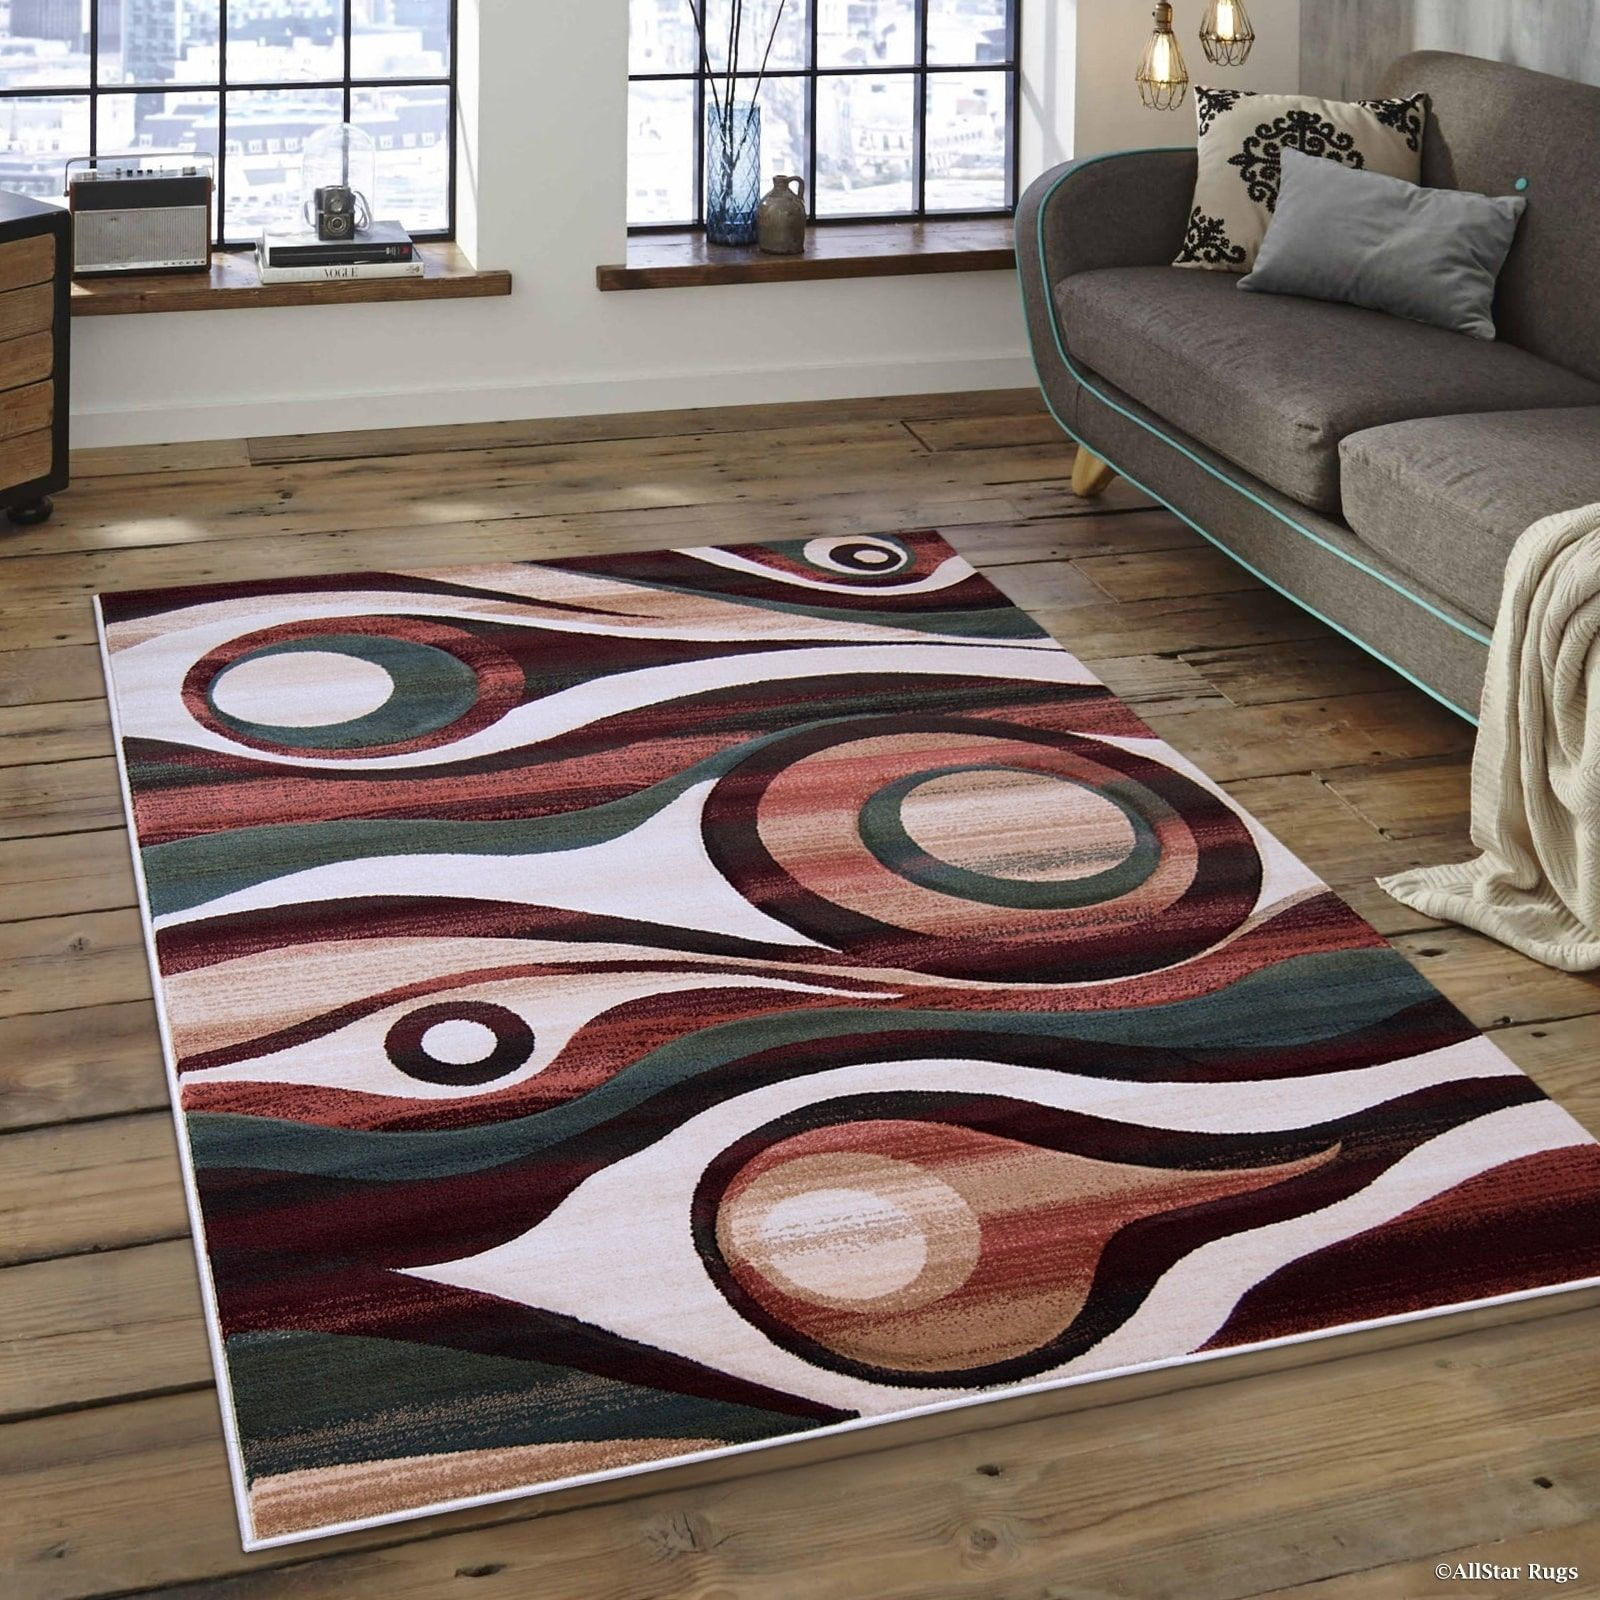 rug for living room size%0A Allstar Transitional Distressed Carved Circle Design Rug    u         X    u            Multi  Size   u     x    u      Polypropylene  Abstract